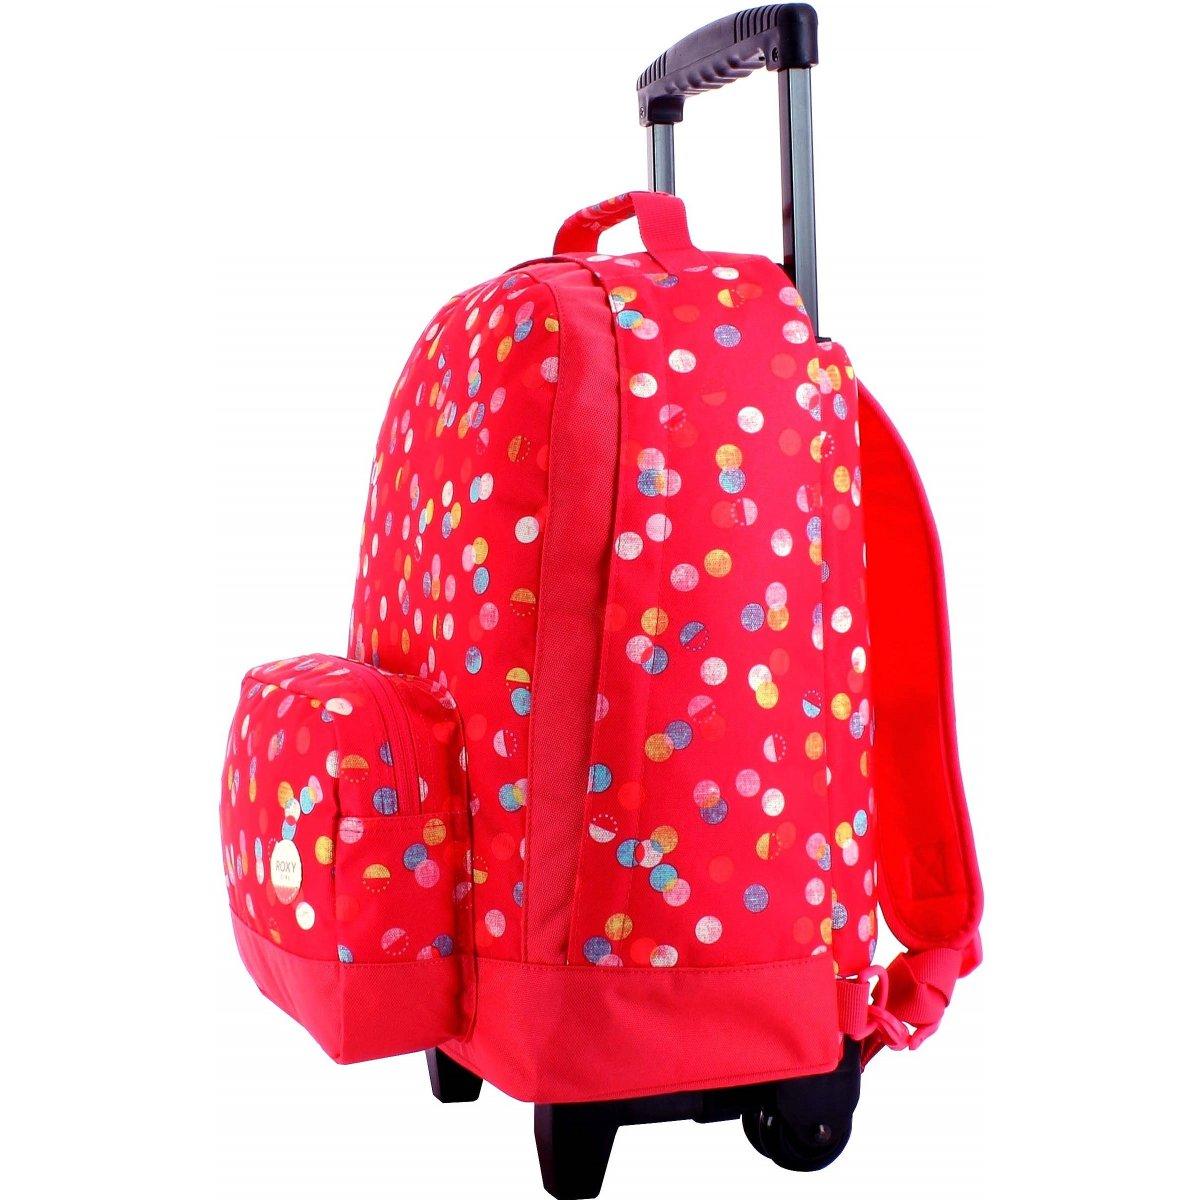 sac dos scolaire roulettes roxy p03016mlr6 couleur principale assortis promotion. Black Bedroom Furniture Sets. Home Design Ideas